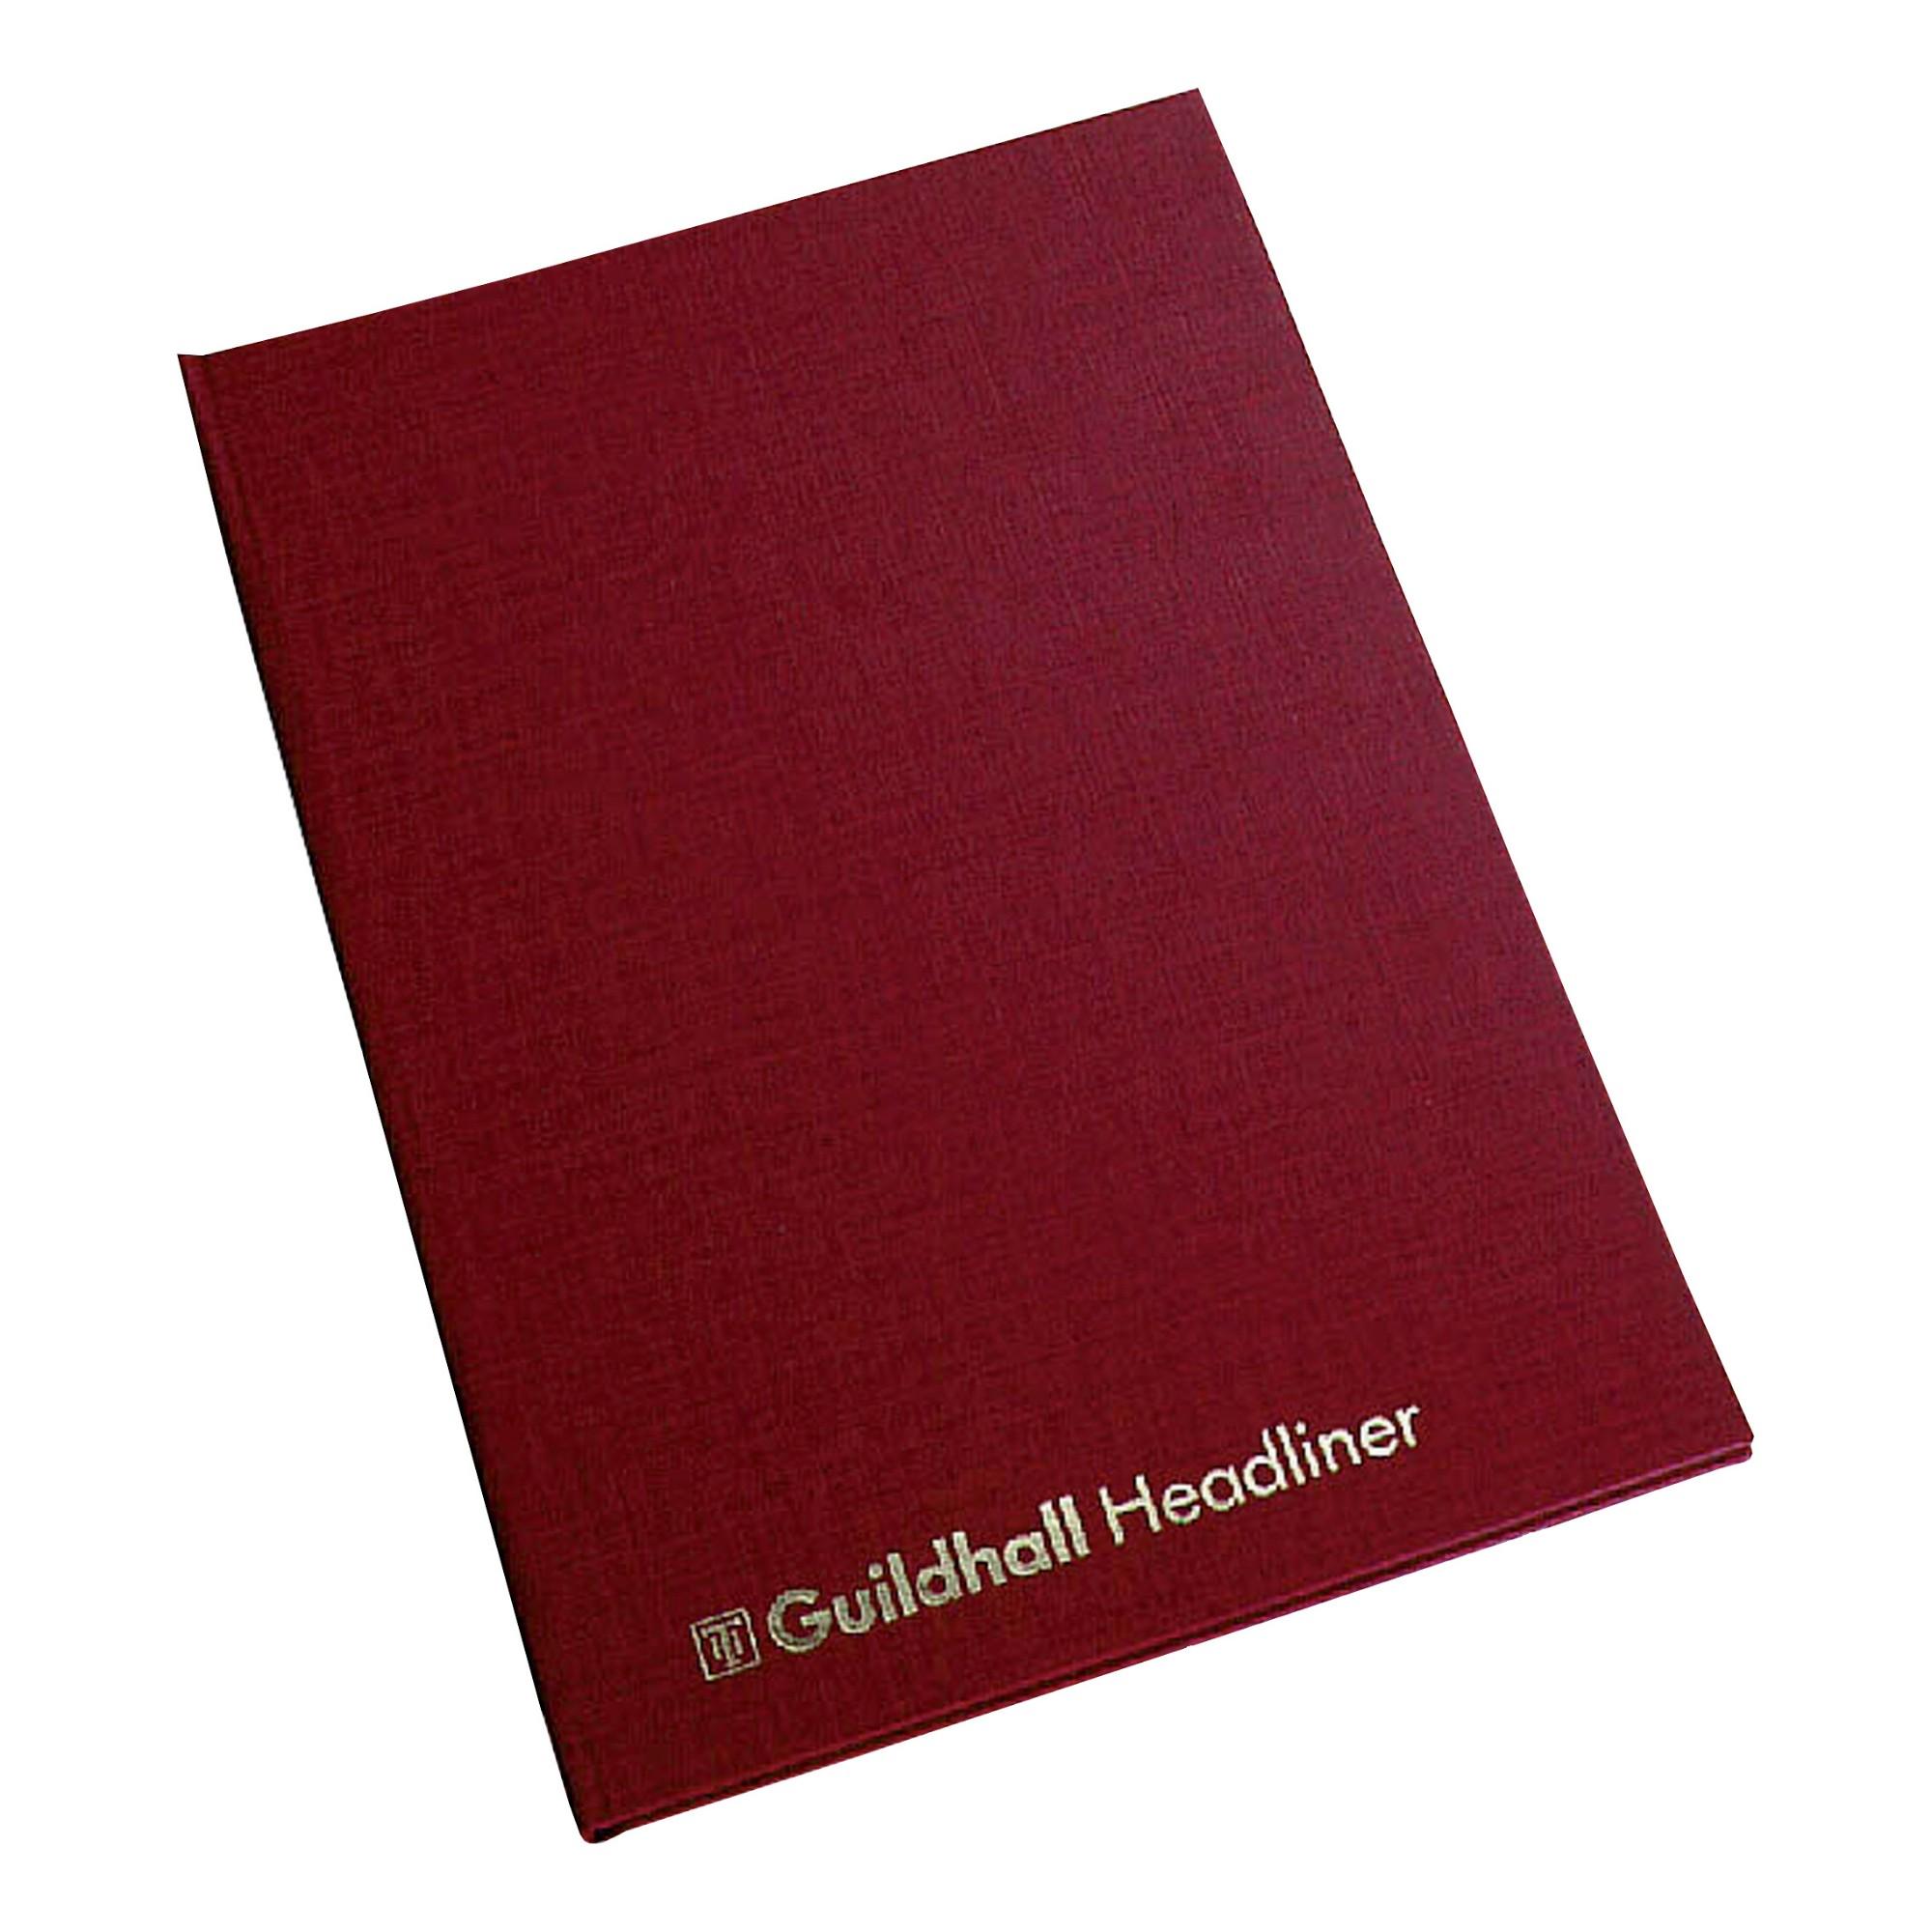 Guildhall 38/16Z Headliner Book 1152